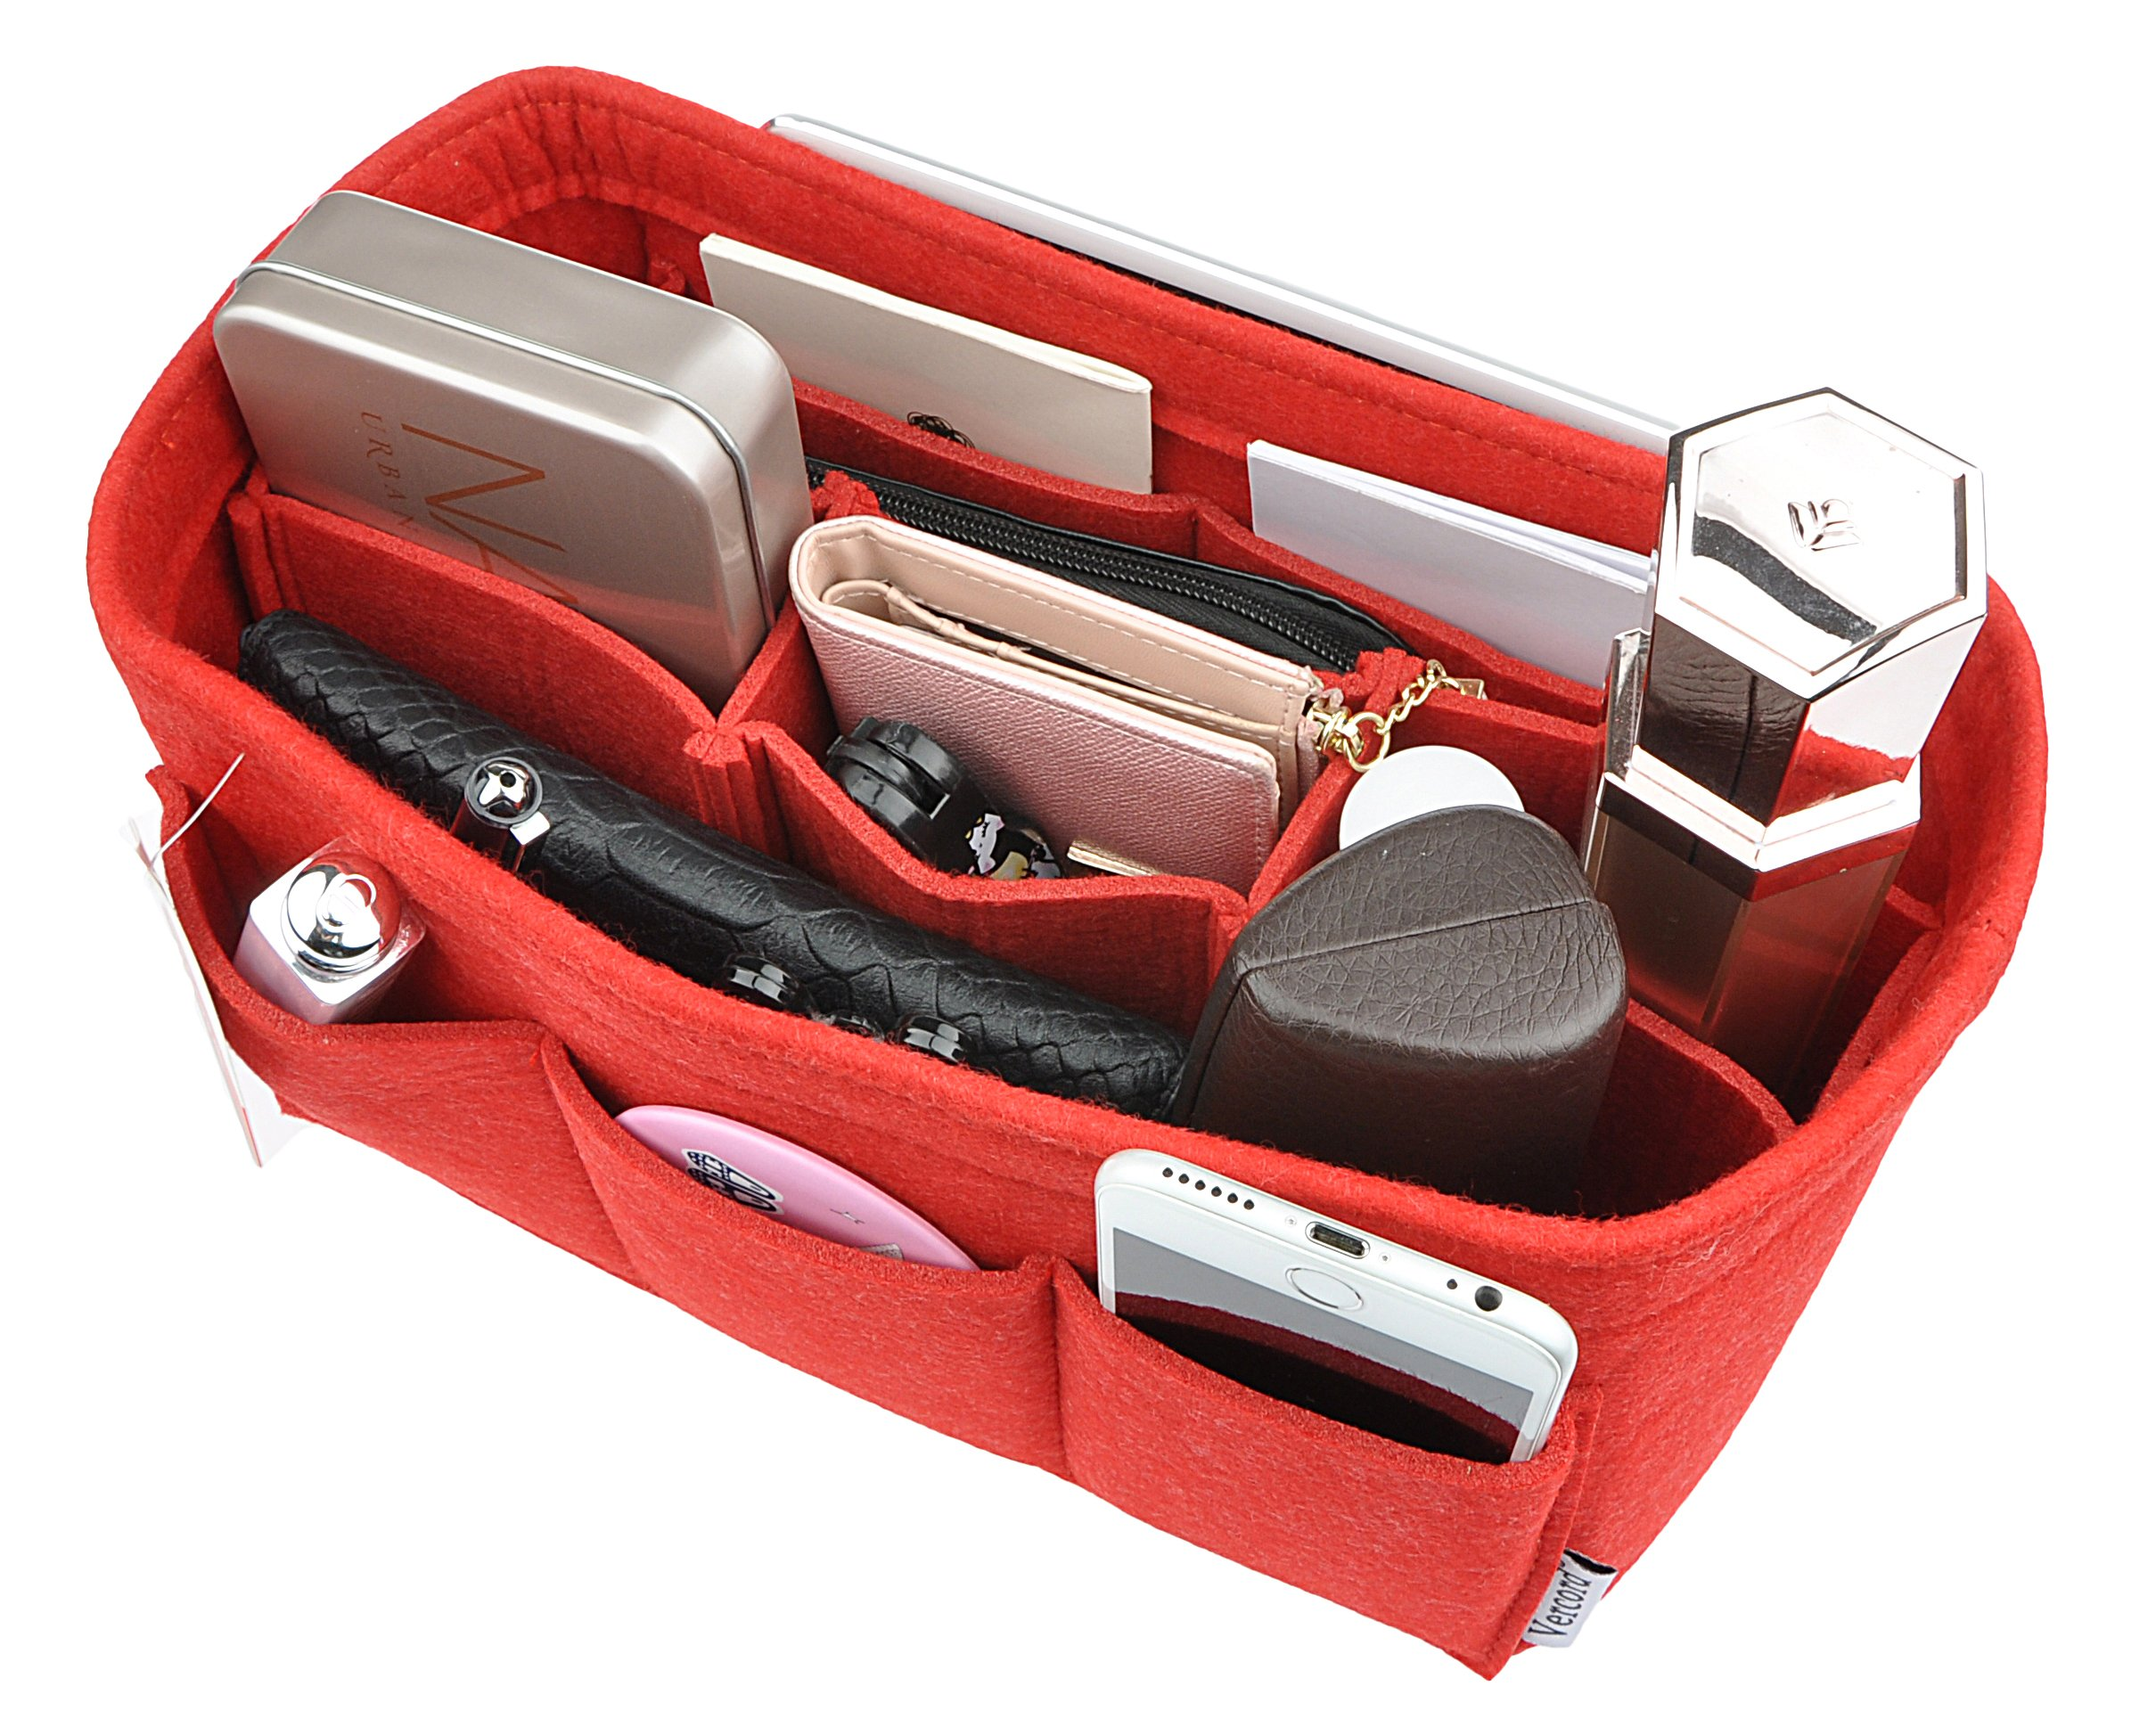 Women's Purse Organzier Sturdy Felt Handbag Liner Insert Bag Red M by Vercord